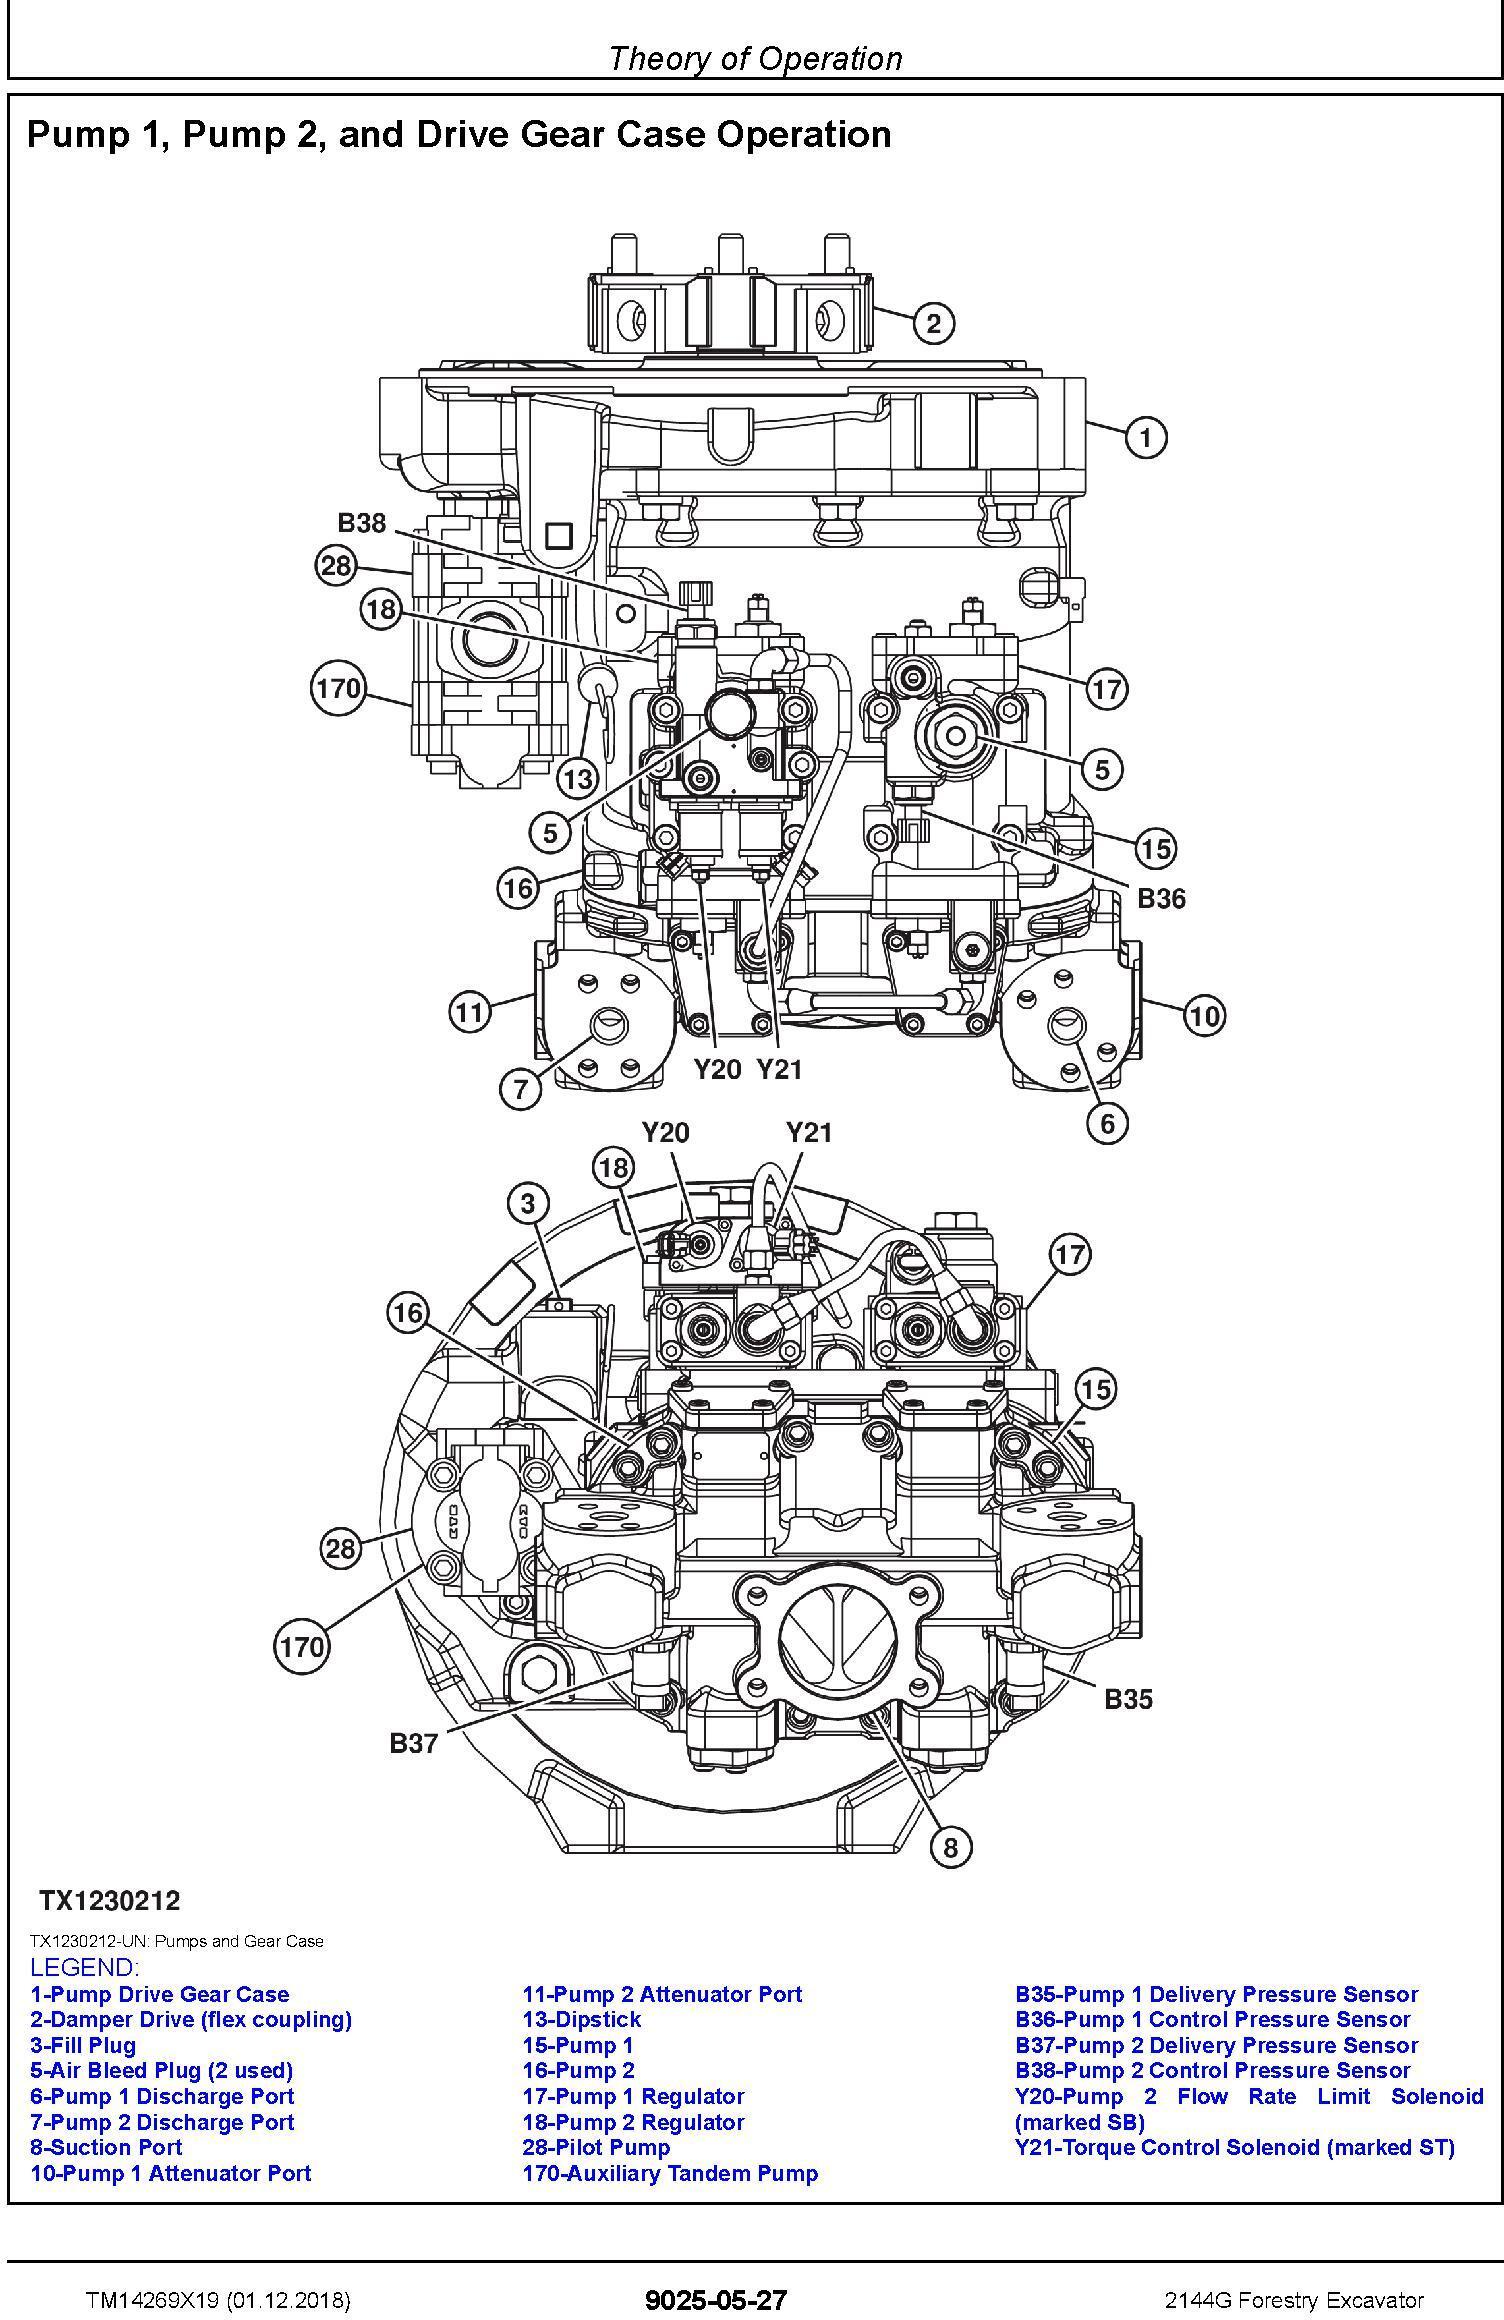 John Deere 2144G (SN. D210001-) Forestry Excavator Operation & Test Technical Manual (TM14269X19) - 2